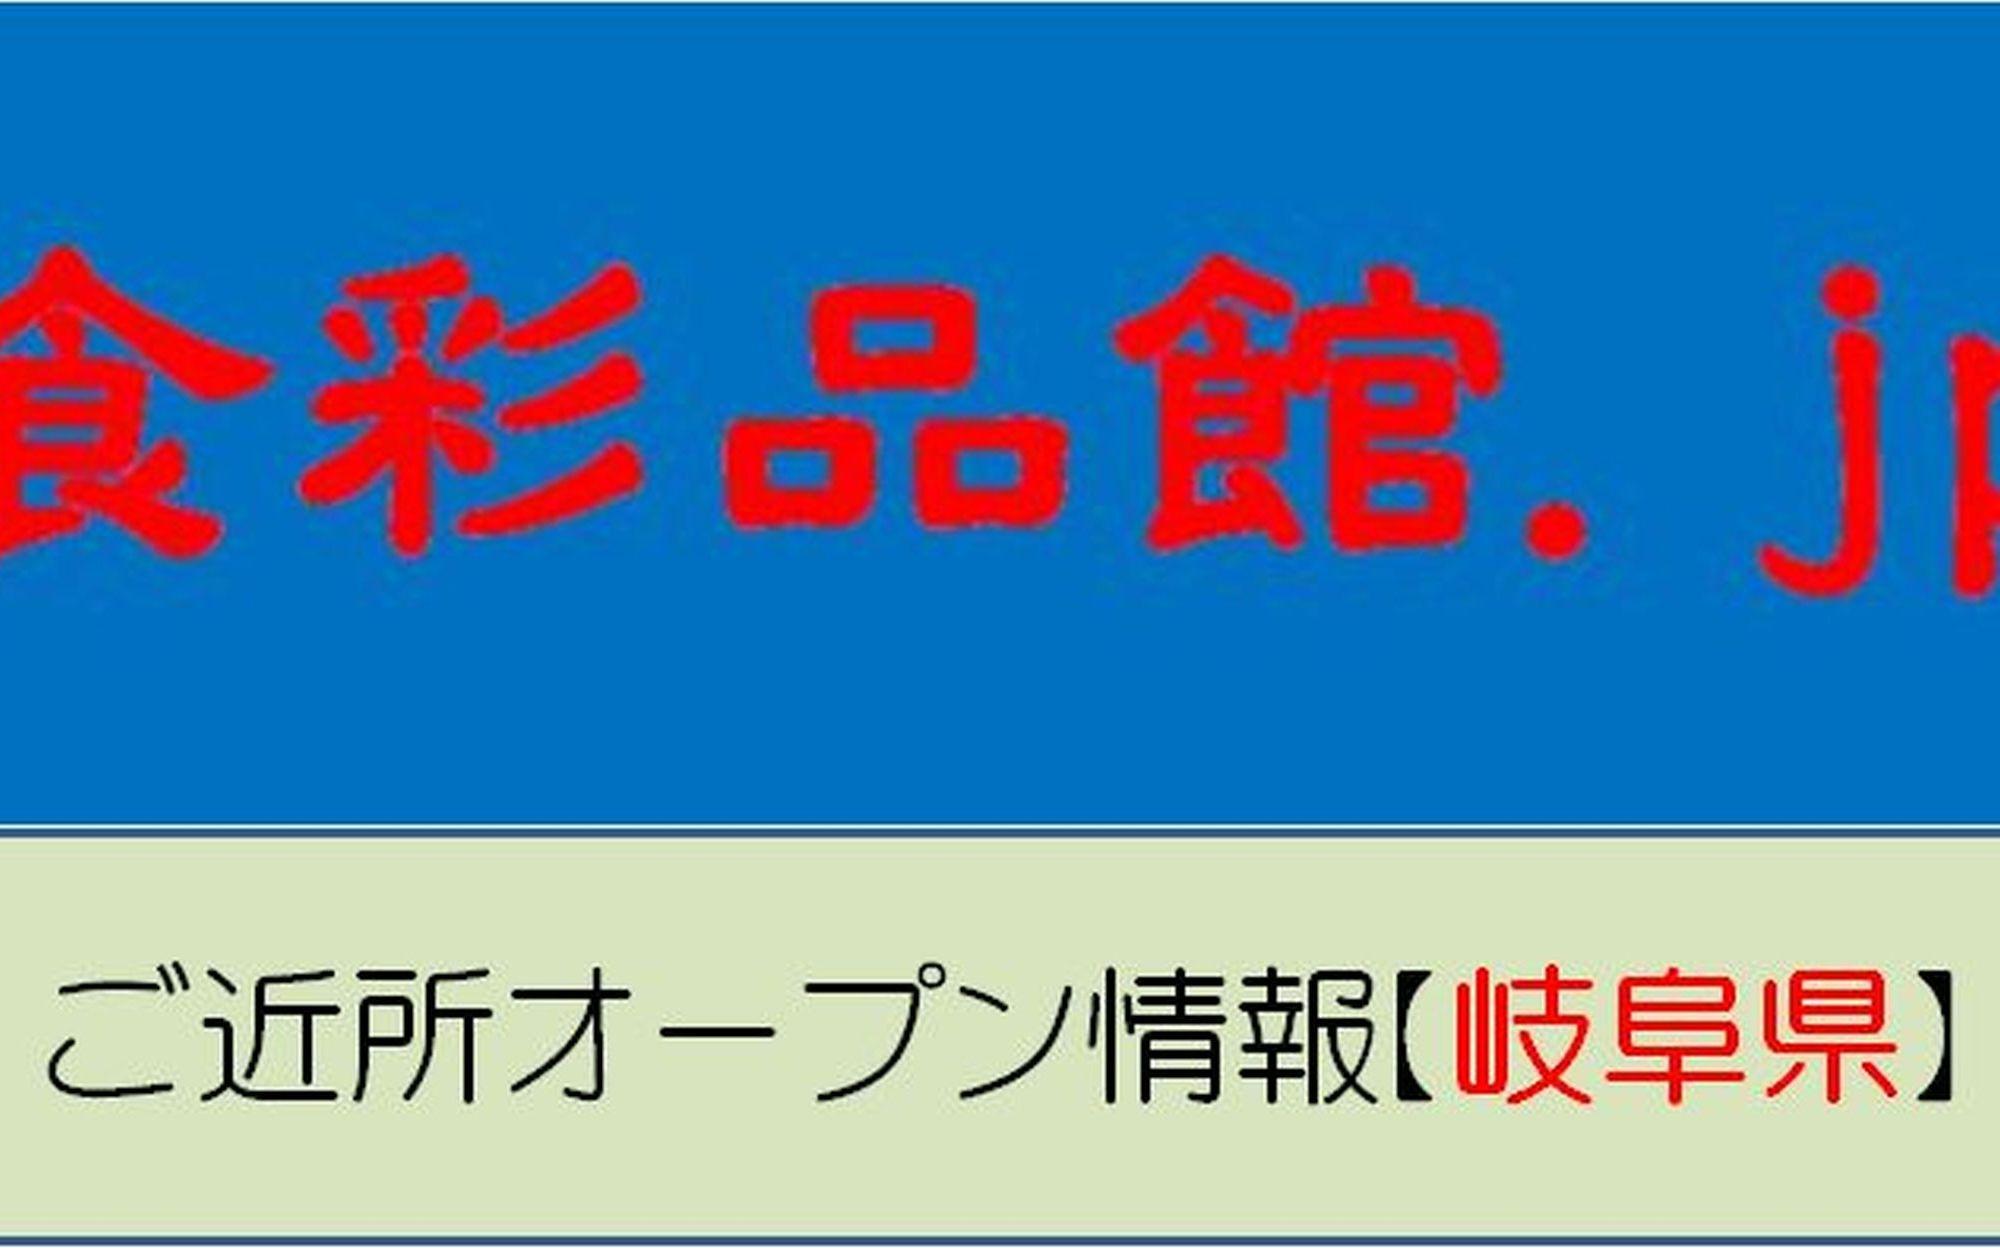 焼肉ジン禾森町店(岐阜県大垣市)2020年2月中旬オープン予定